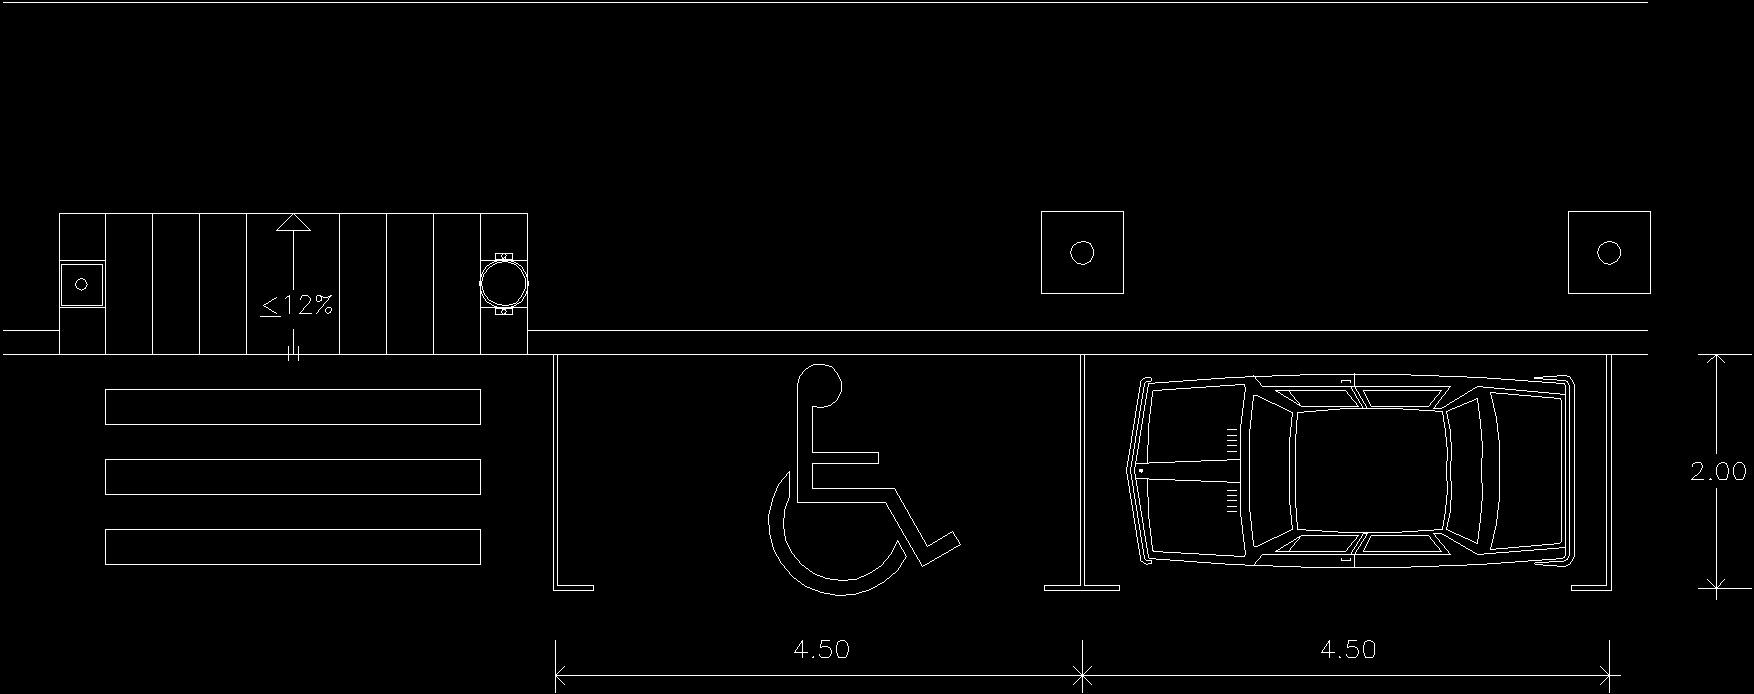 Handicapped Parking 2d Dwg Block For Autocad Designs Cad